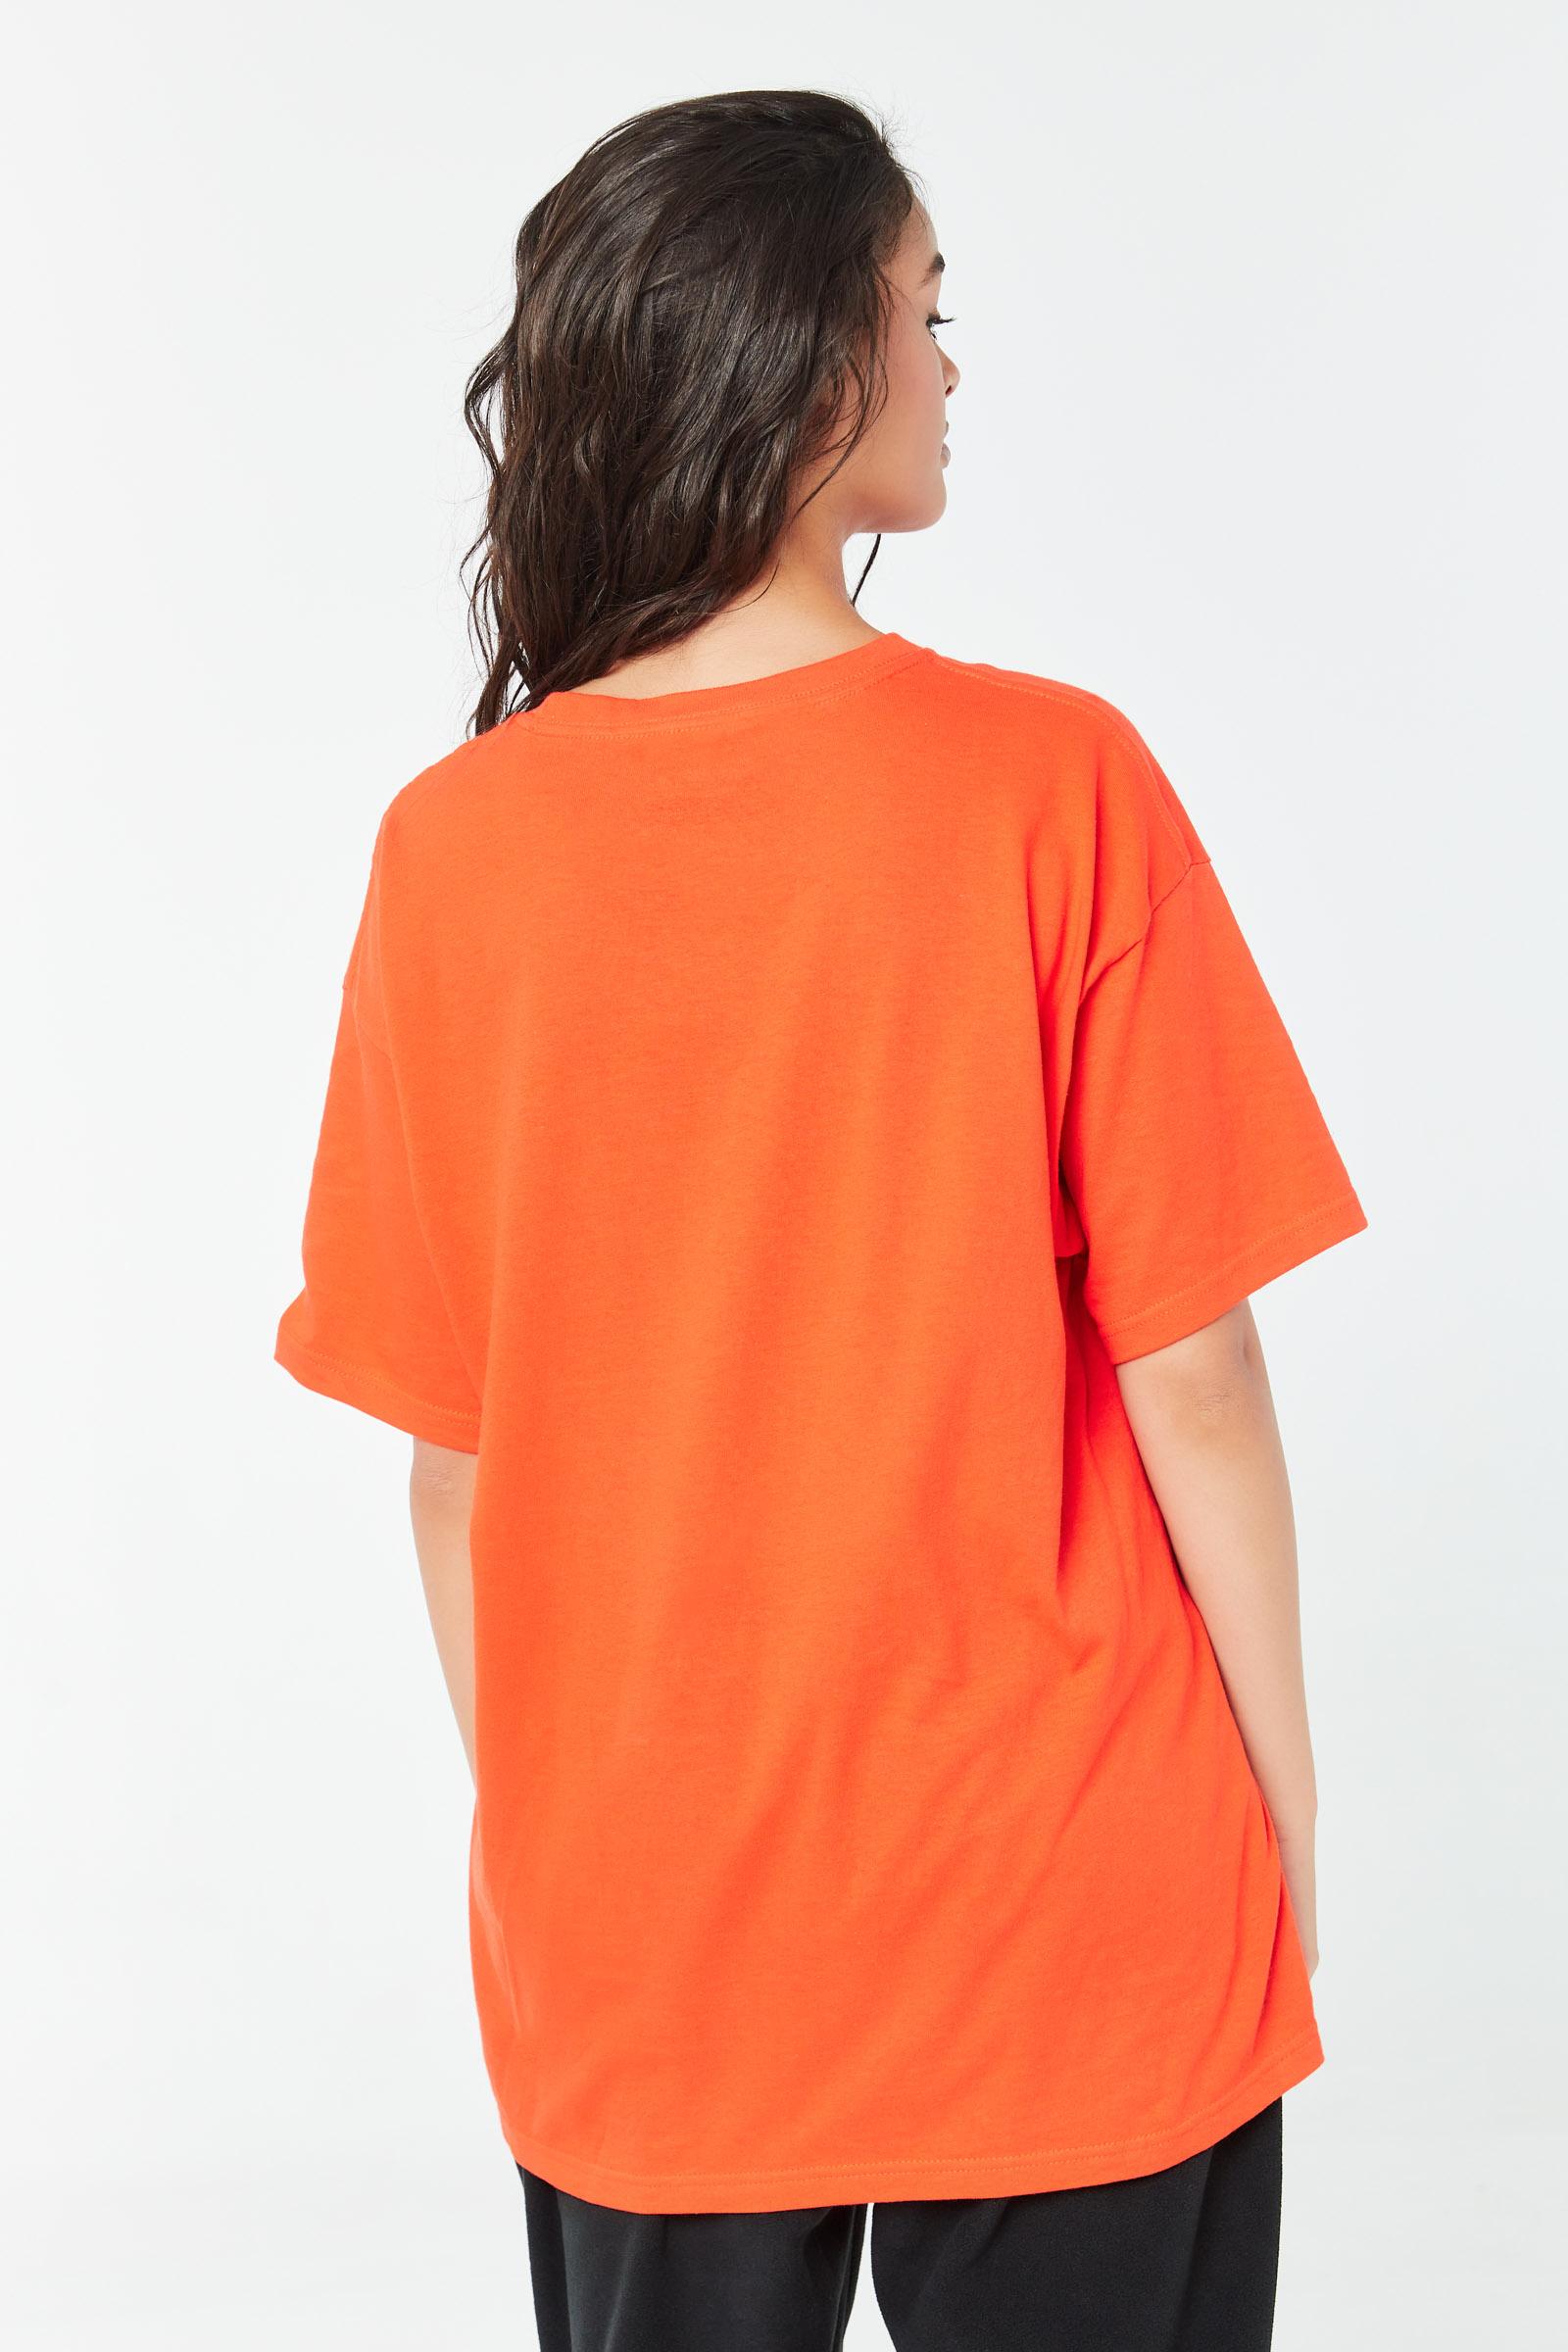 T-shirt Reese's